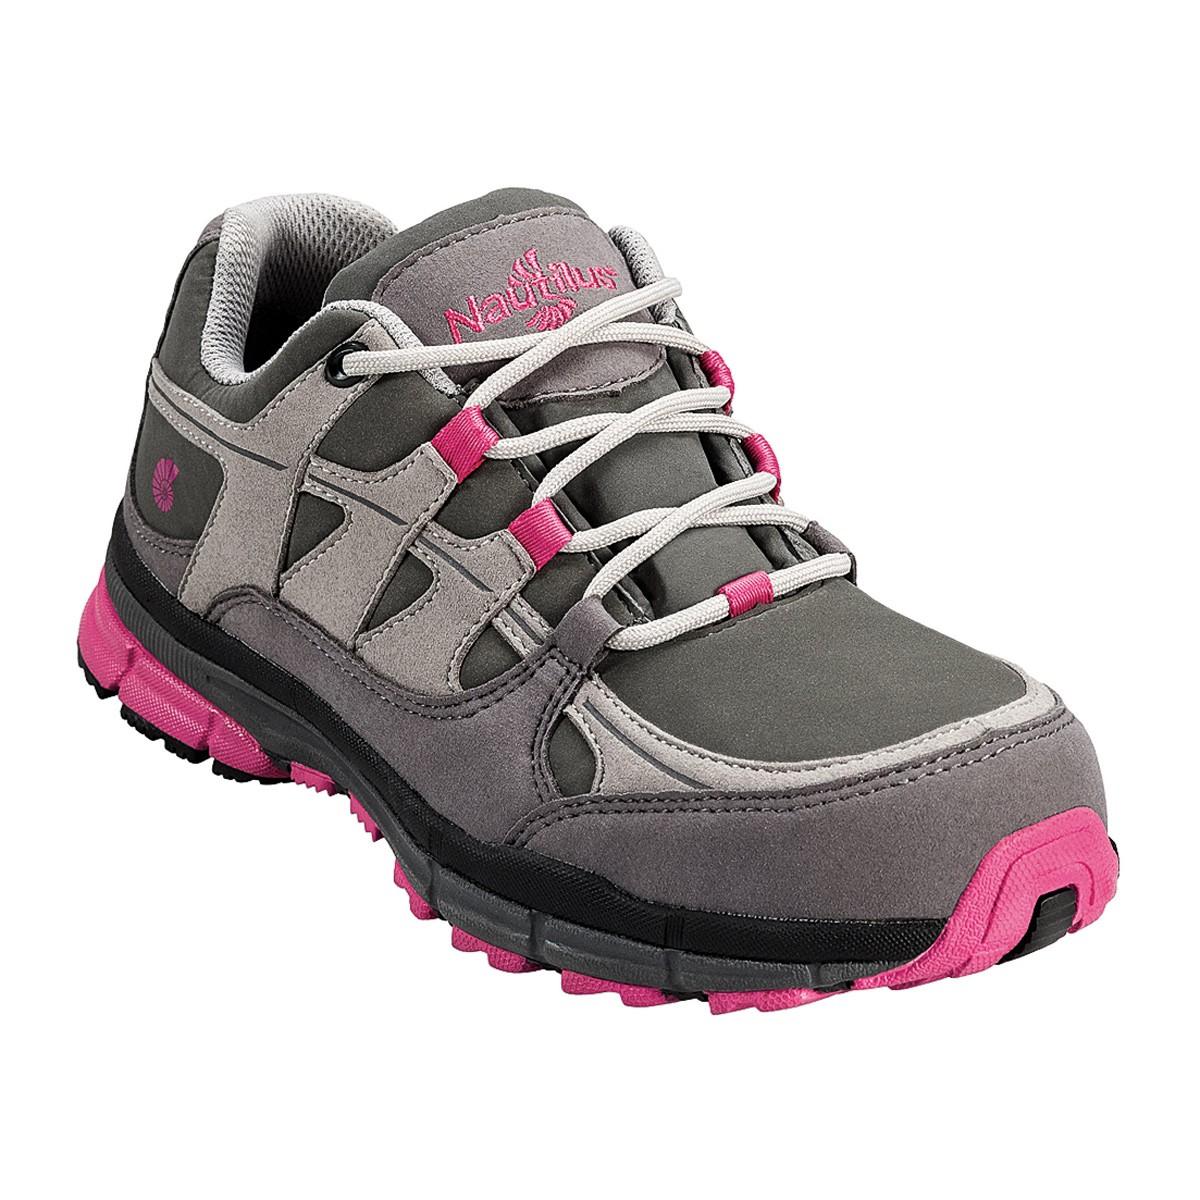 steel toe shoes for women nautilus womenu0027s pink and grey steel toe shoe - n1771 losuqpc